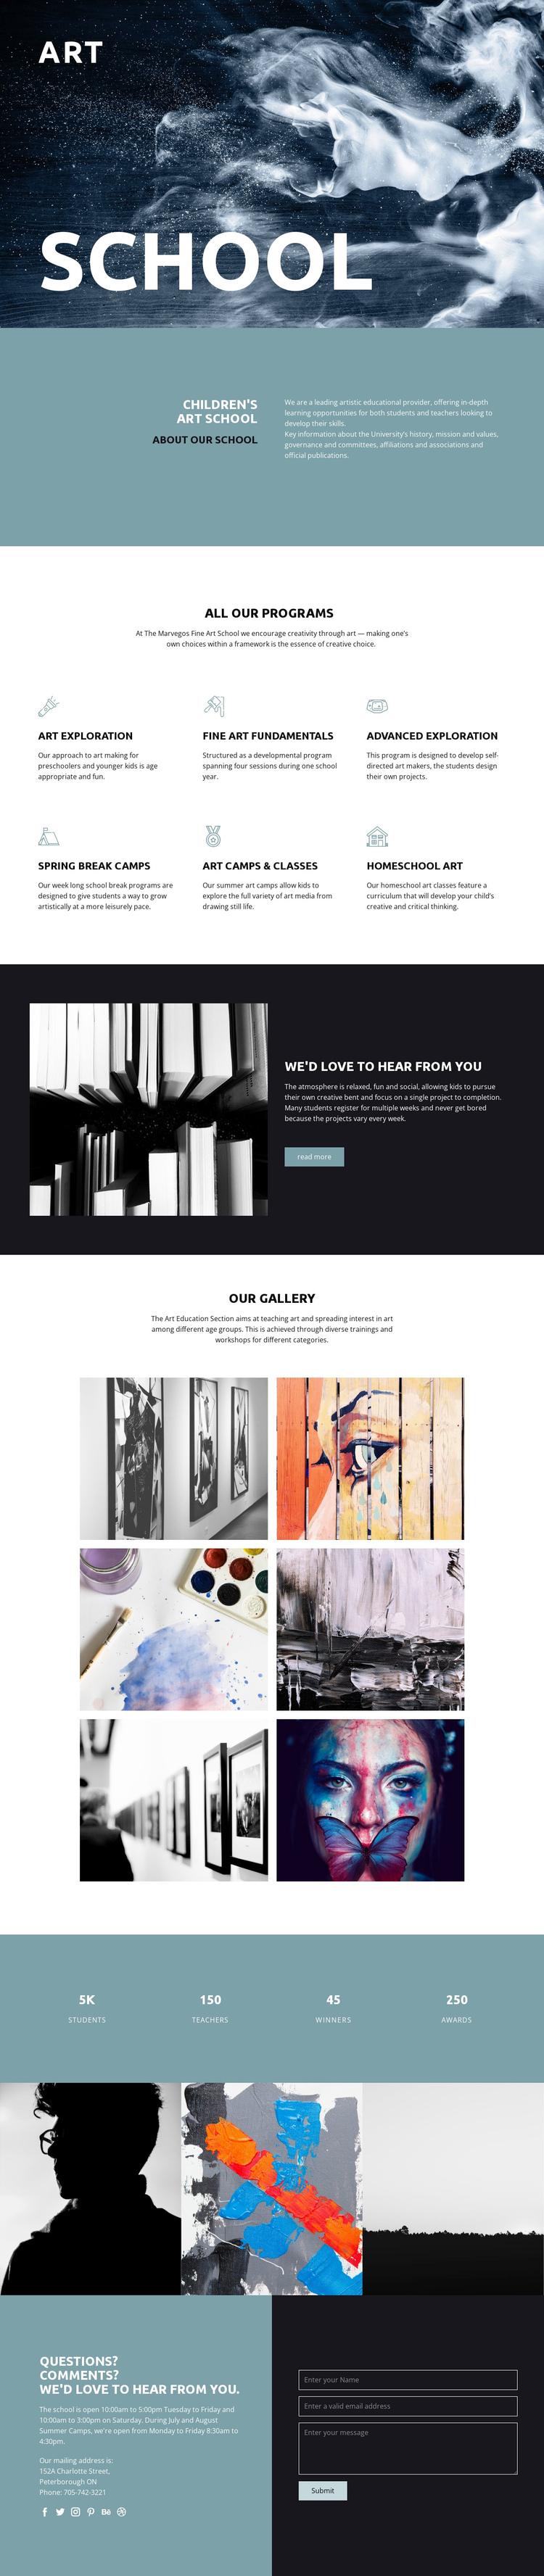 School of artistic education Website Builder Software